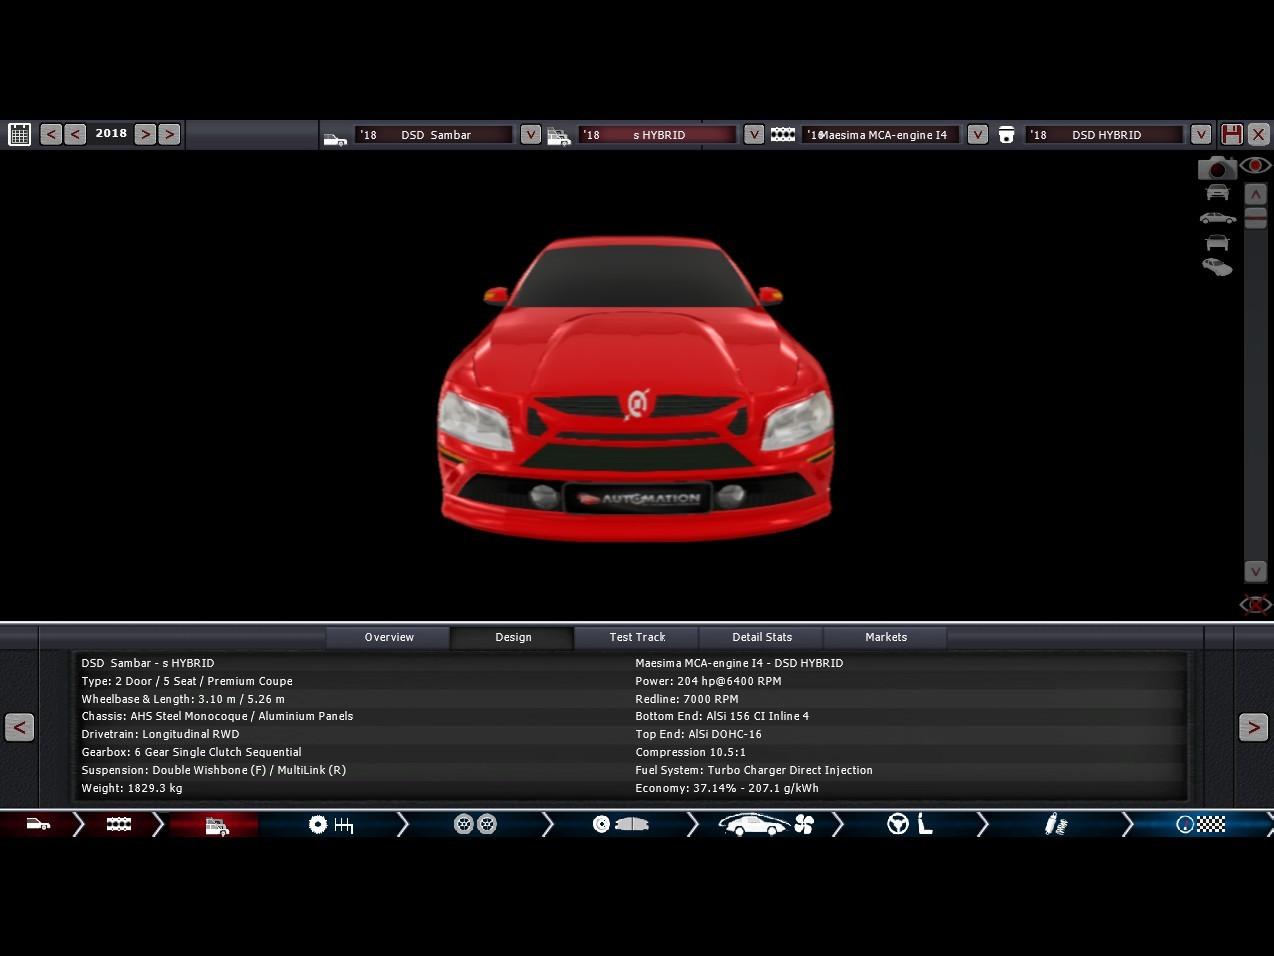 dsd and dsd racing dsd hybrid confirmed for 2018 car design 20161102151251 1 jpg1274x956 112 kb